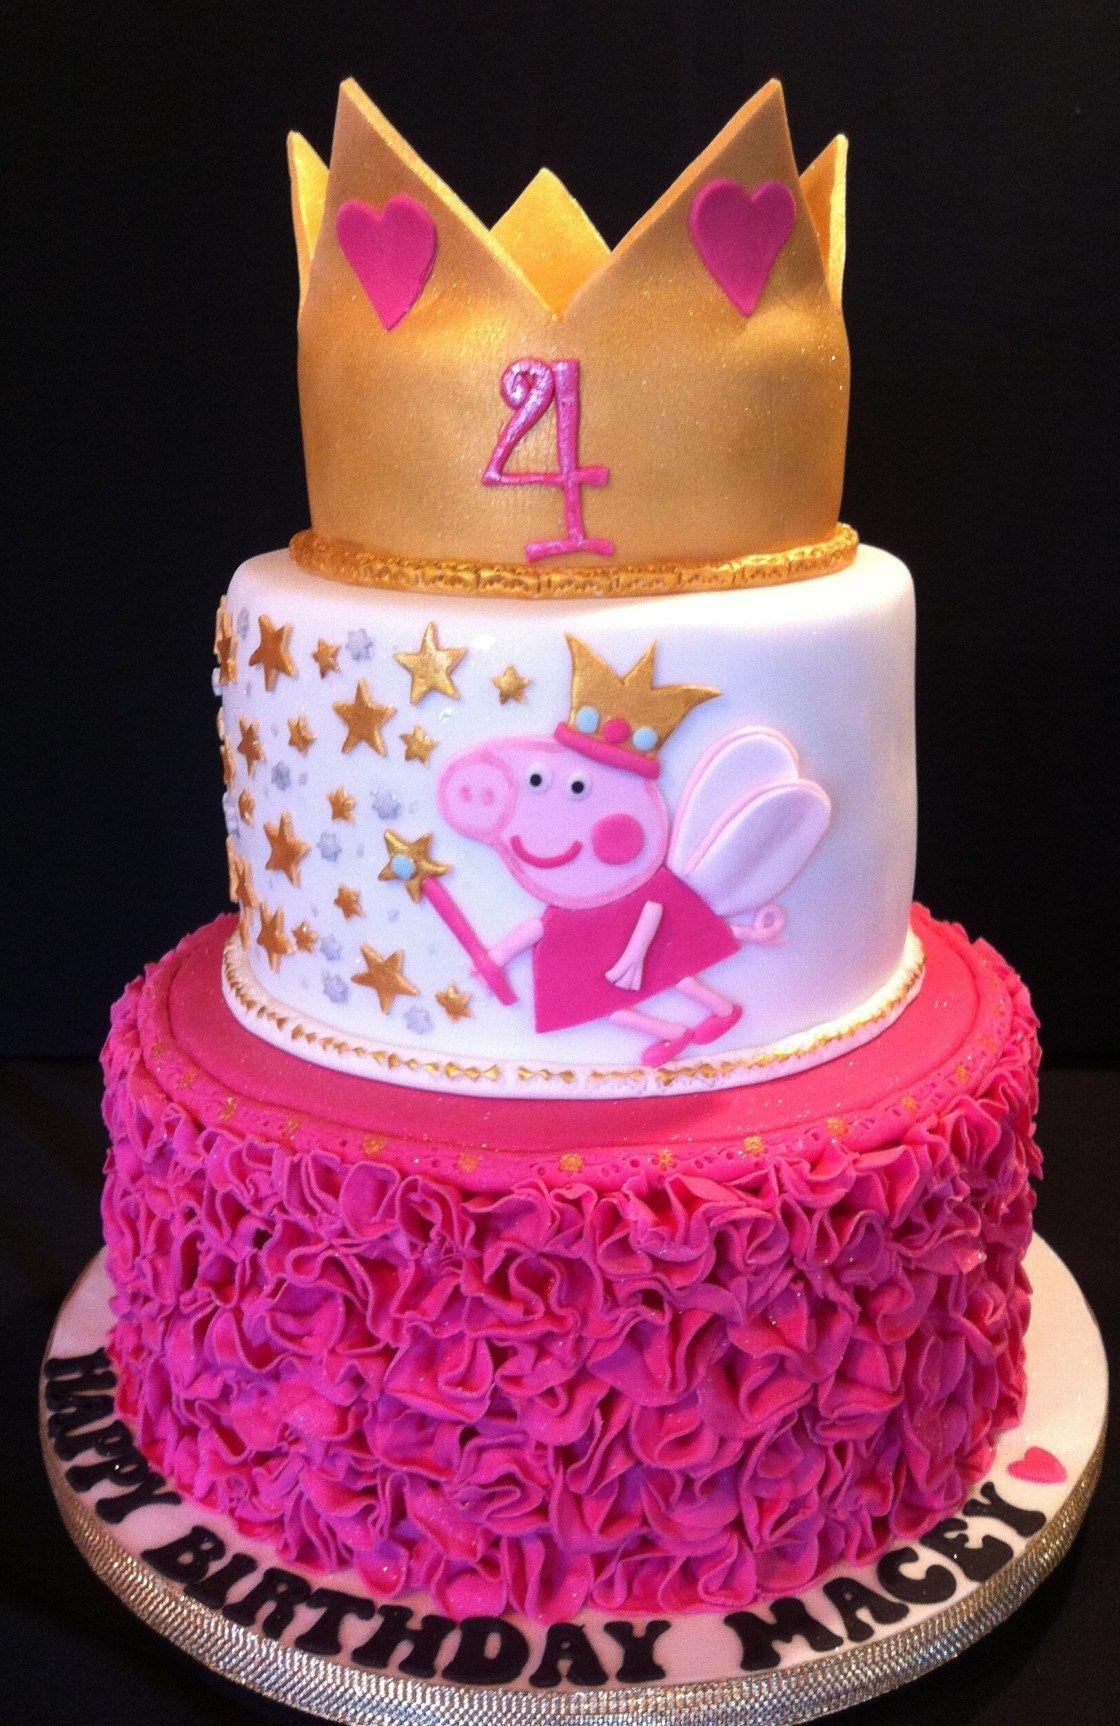 Peppa Pig Geburtstagstorte Peppa Pig Prinzessinstorte Brelynn 4 Pinterest Pig Geburtstagstorte Pig   – Alex's 4th birthday